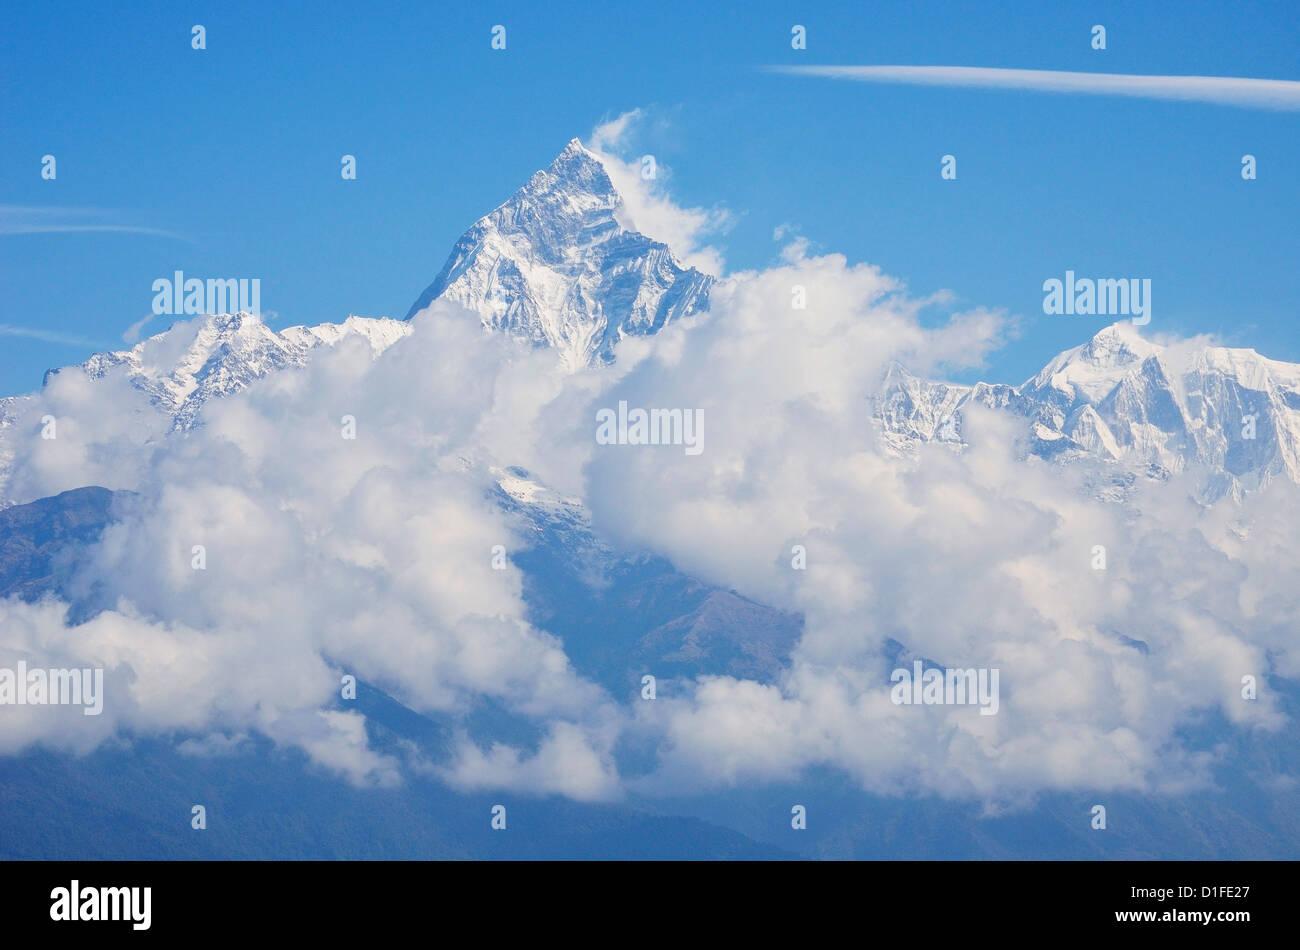 Machapuchare seen from Sarangkot, Gandaki Zone, Western Region, Nepal, Himalayas, Asia - Stock Image